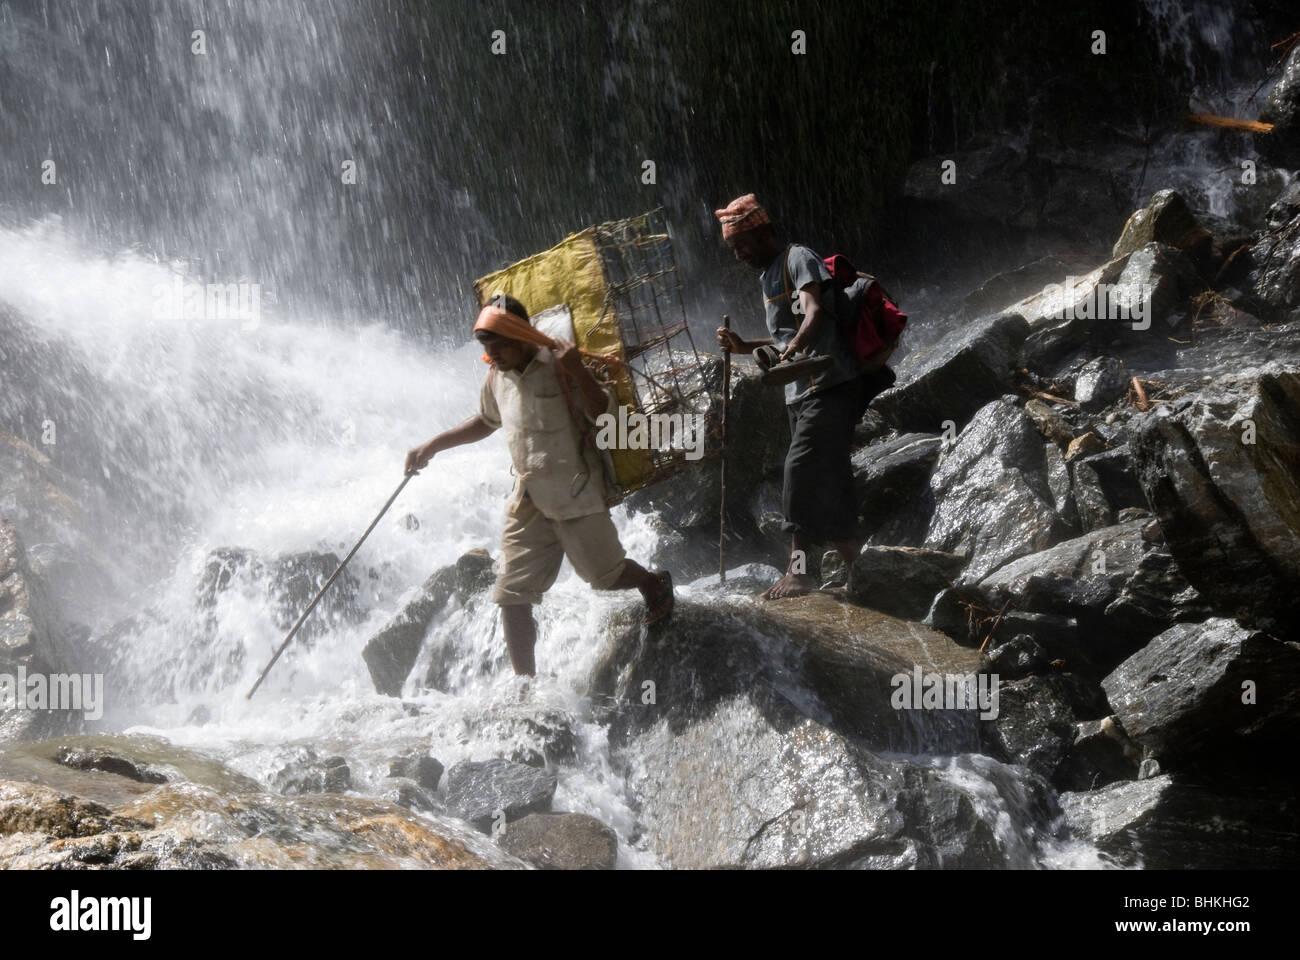 Porters carrying loads across waterfall, near Karte, Annapurna Circuit, Nepal - Stock Image